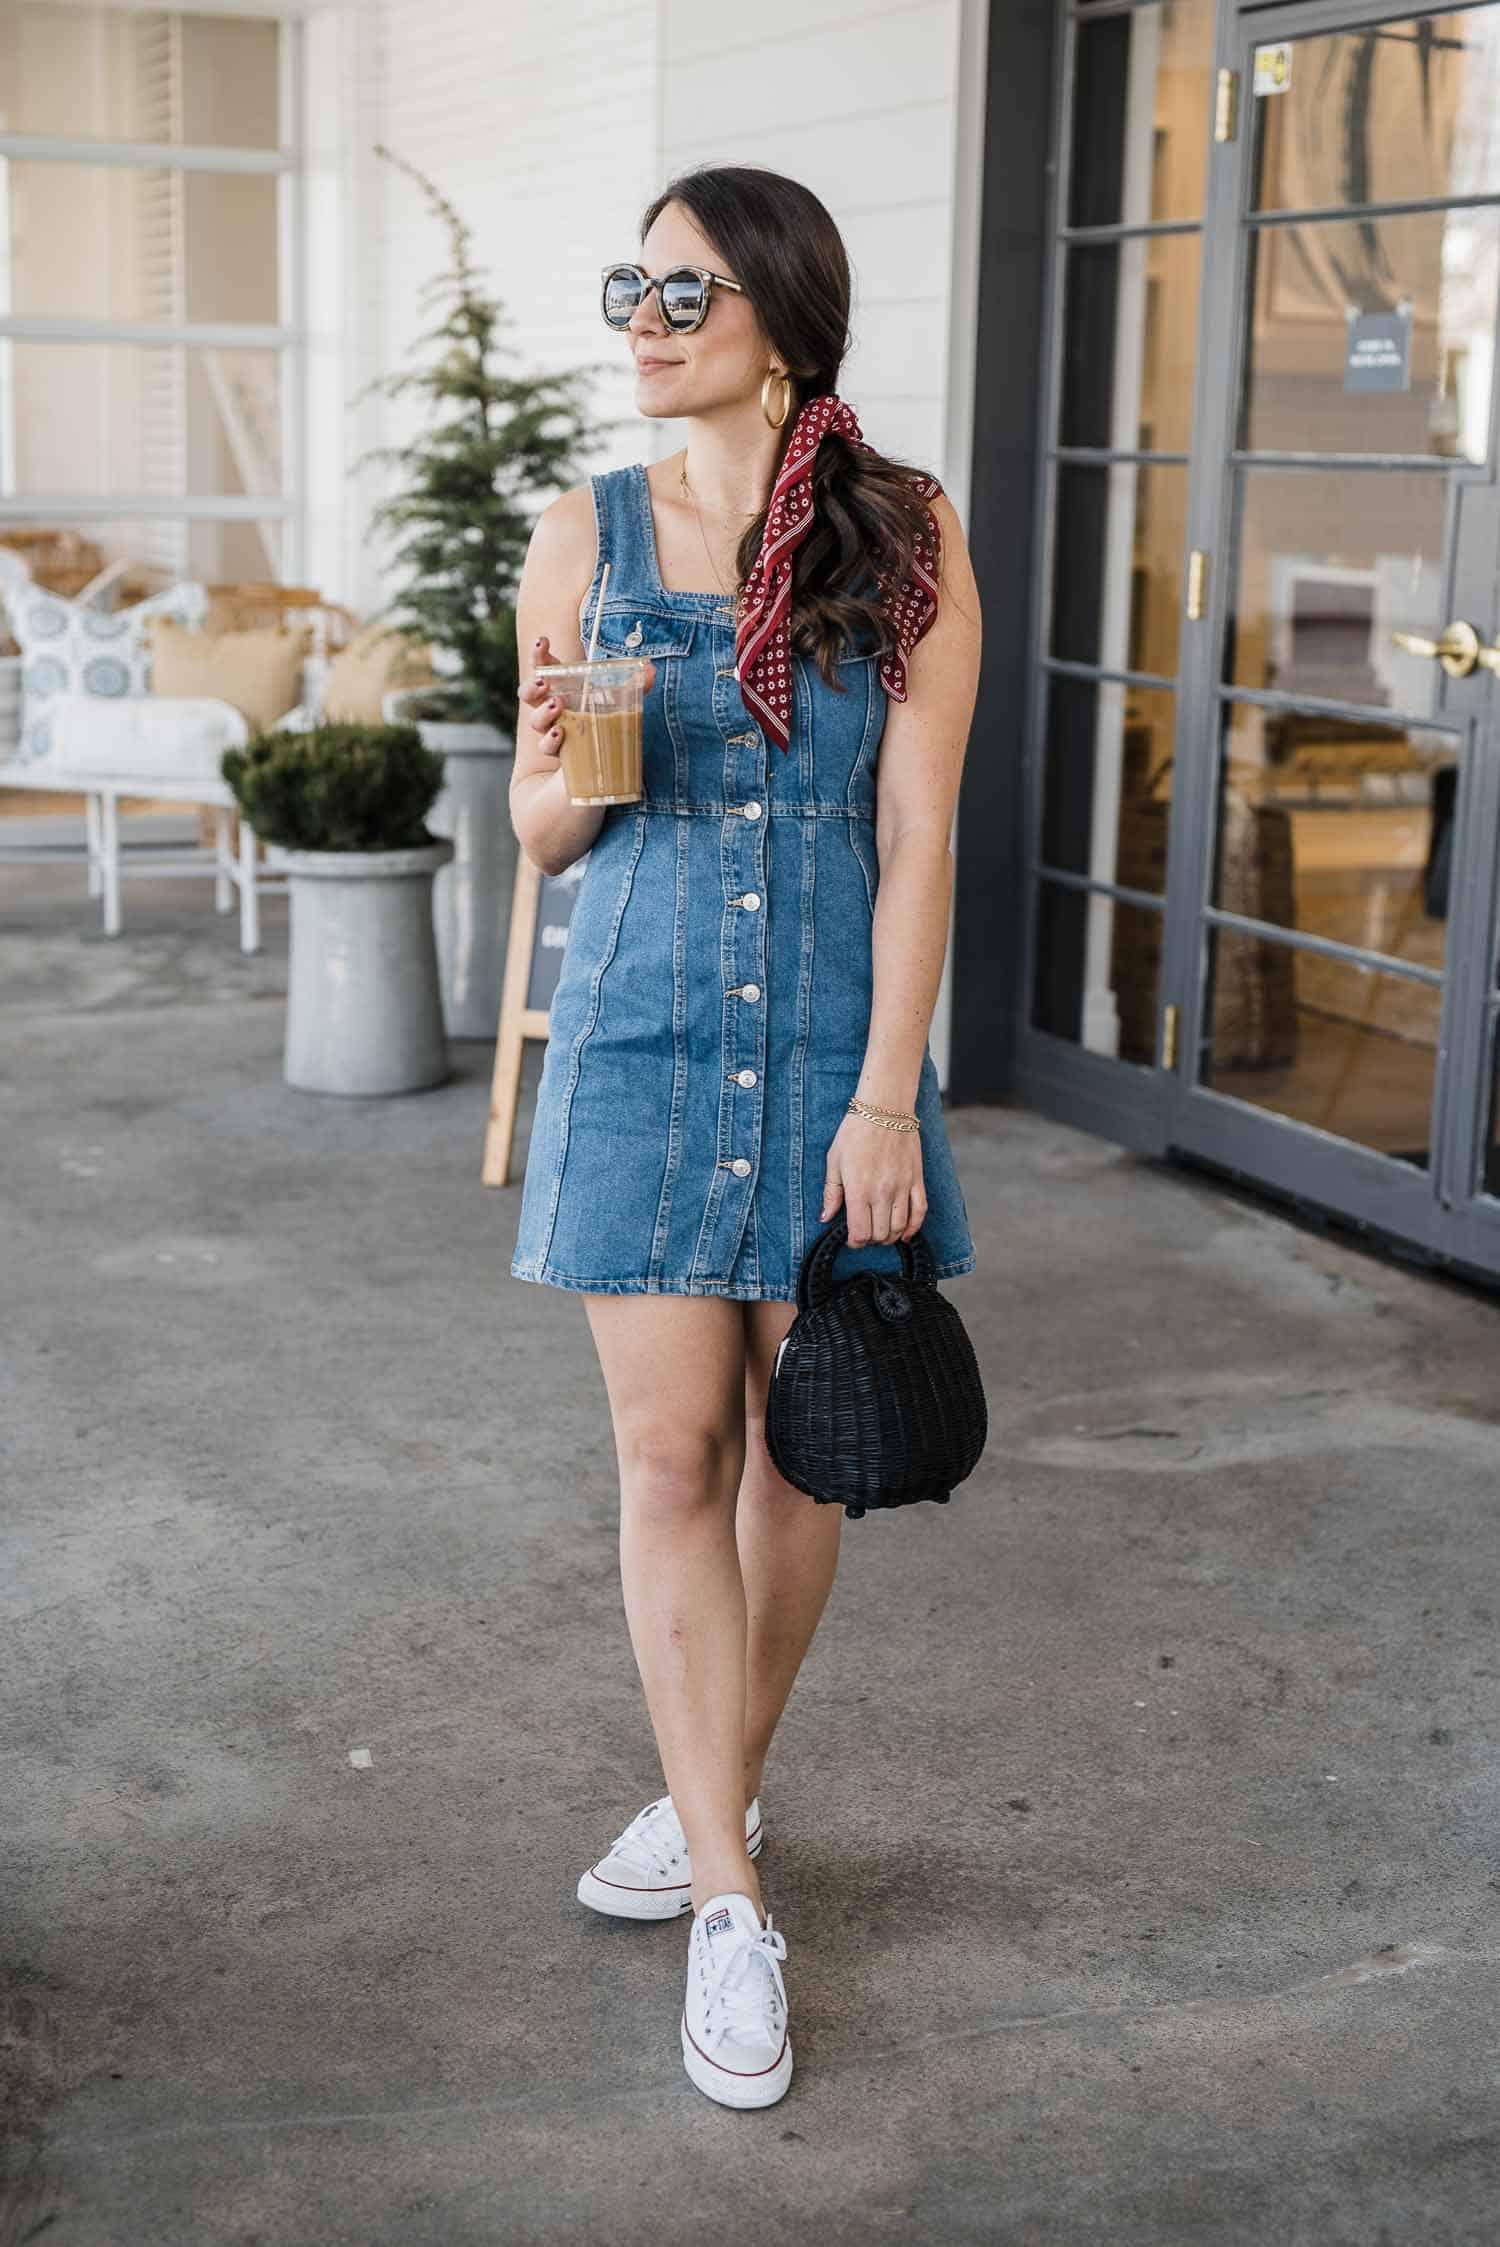 Spring dresses under $50 by My Style Vita